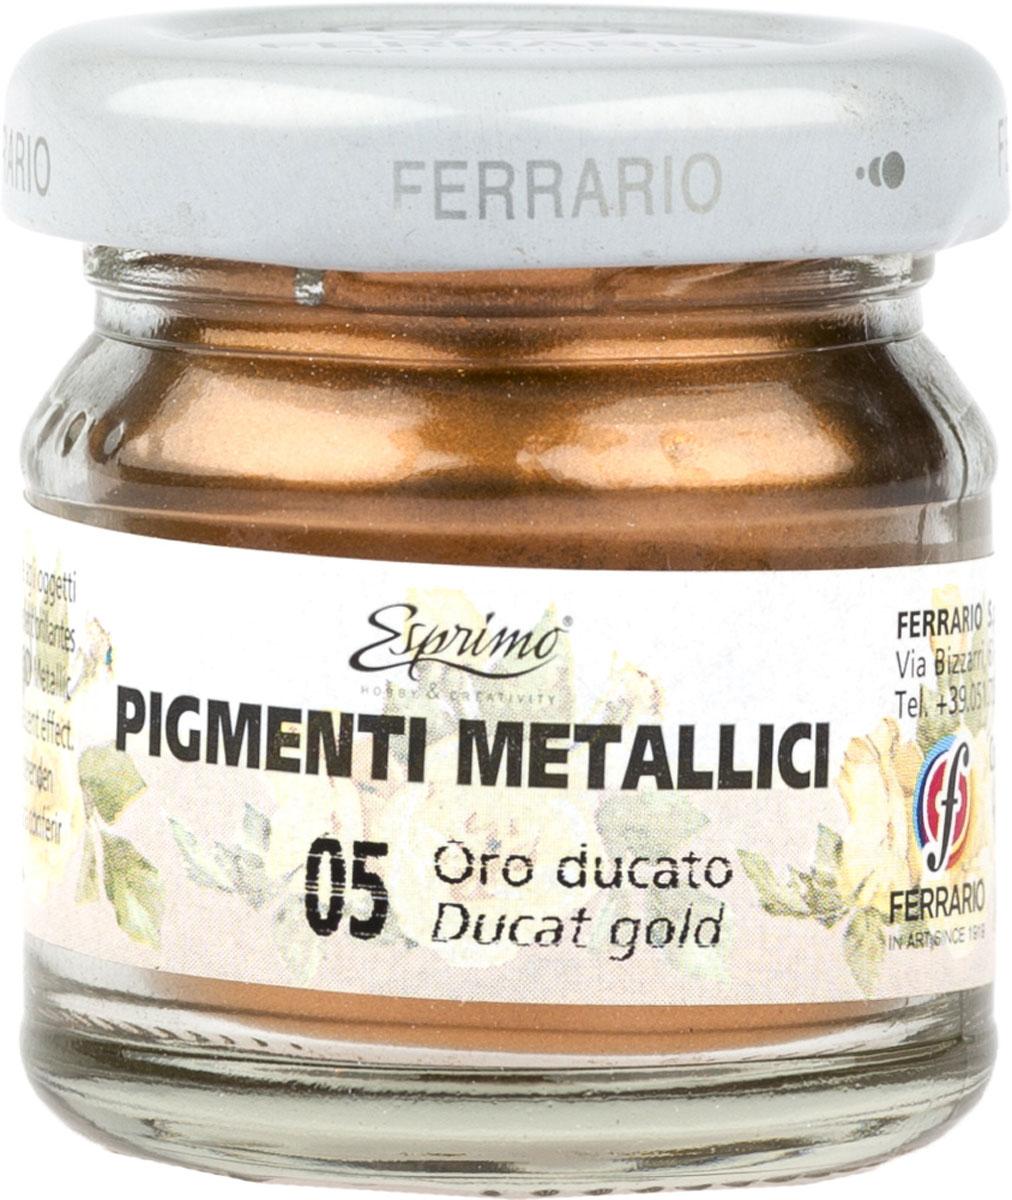 Ferrario Пигмент металлик цвет 005 дукатное золото ferrario краска масляная van dyck цвет 91 золото av1116bo91